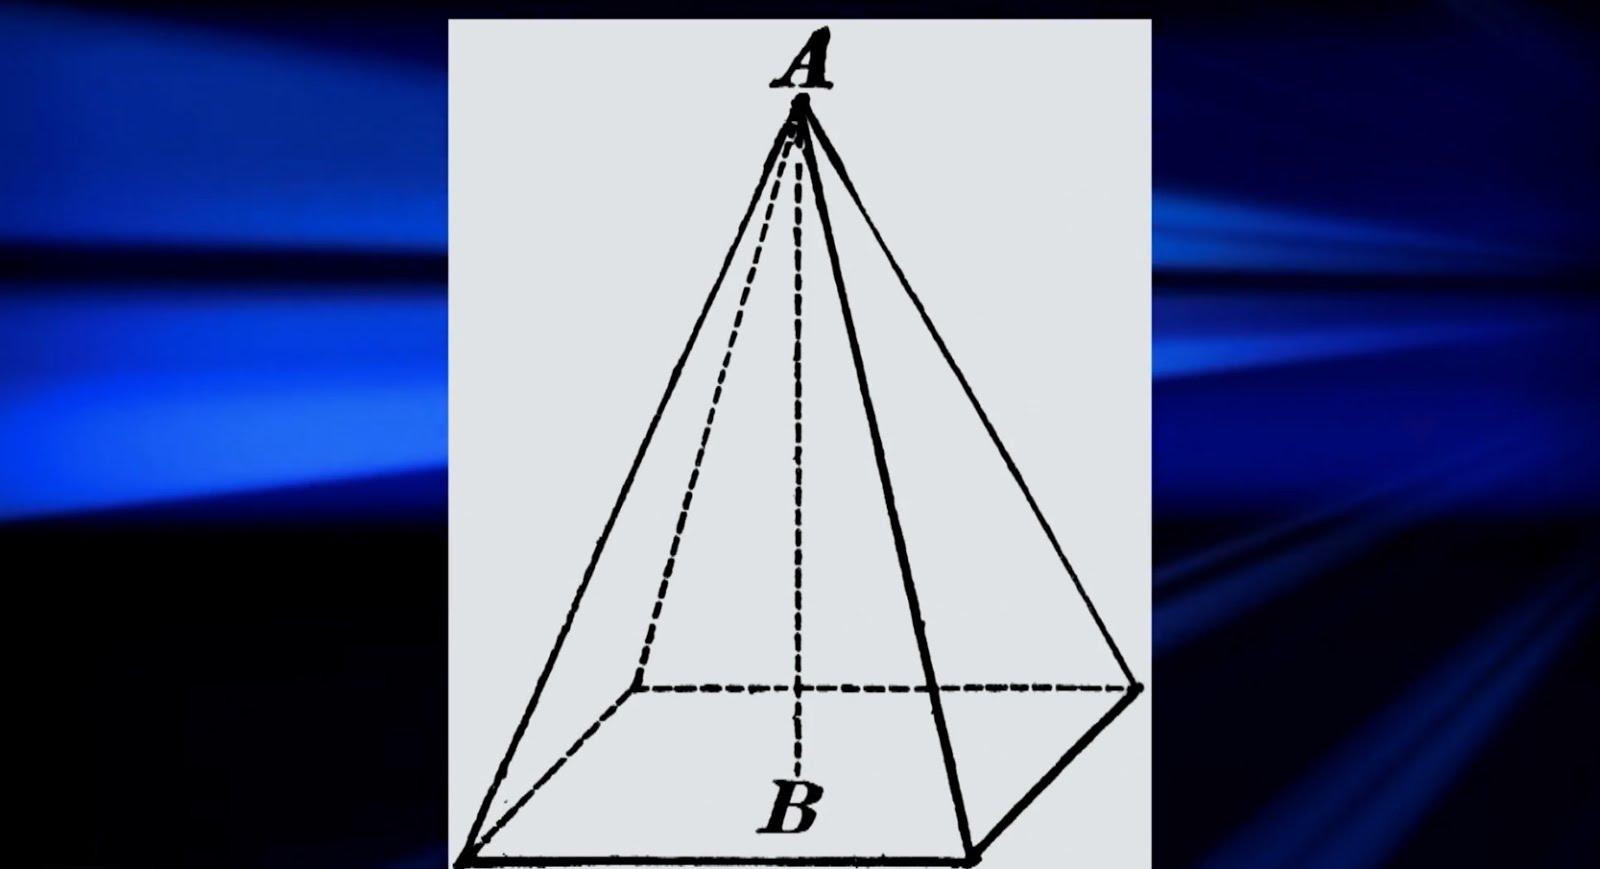 ImageSpace - 72 Degree Pyramid | gmispace com